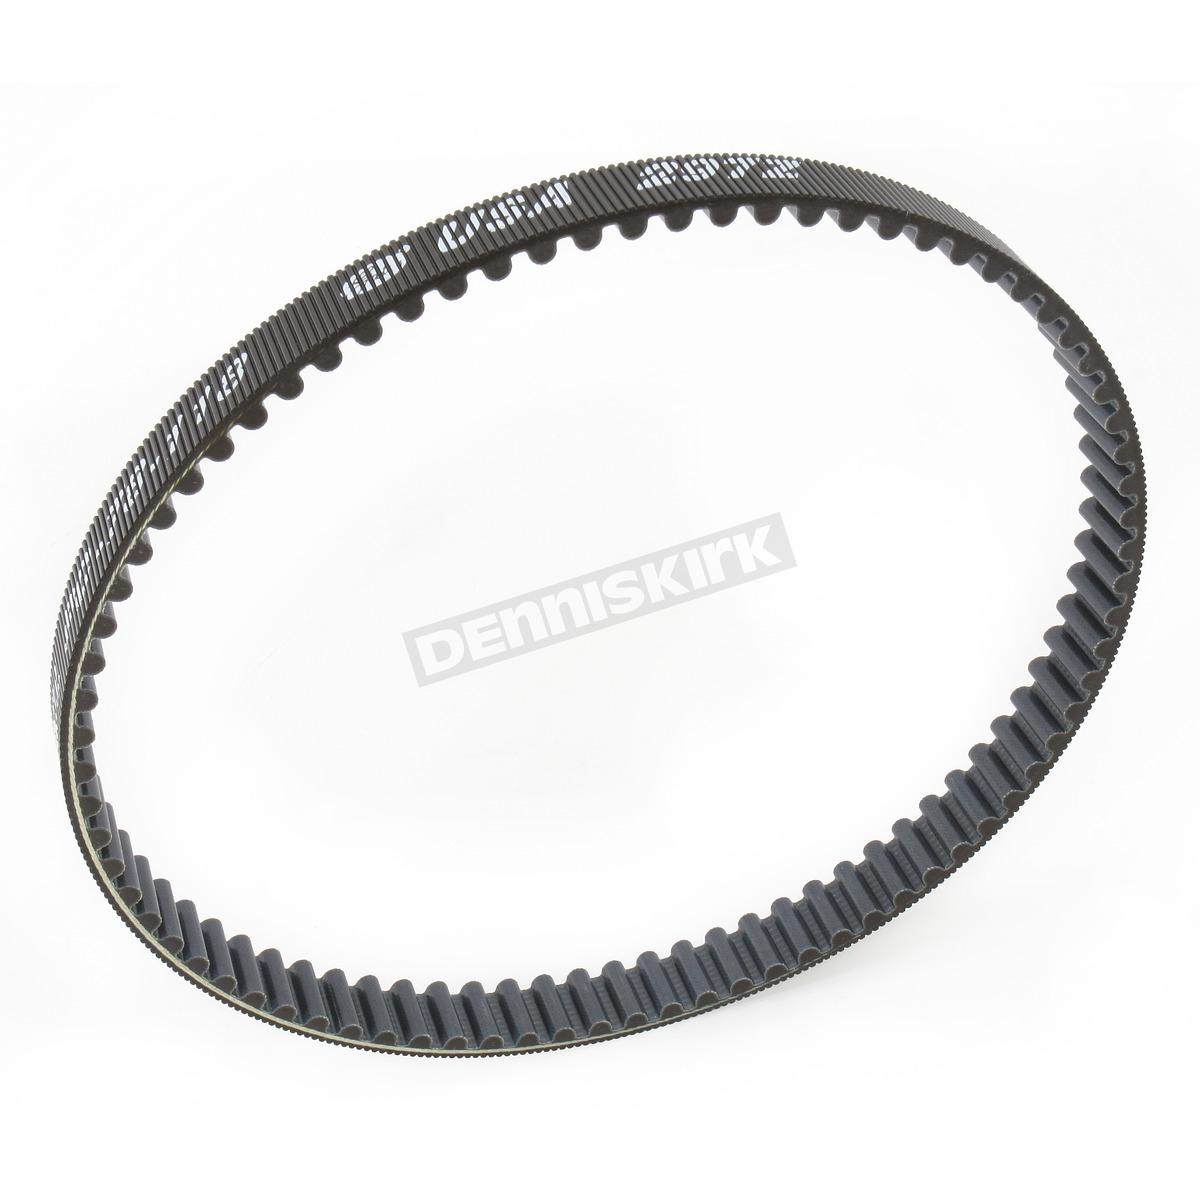 Belt Drives Ltd Primary Belt 13 8mm